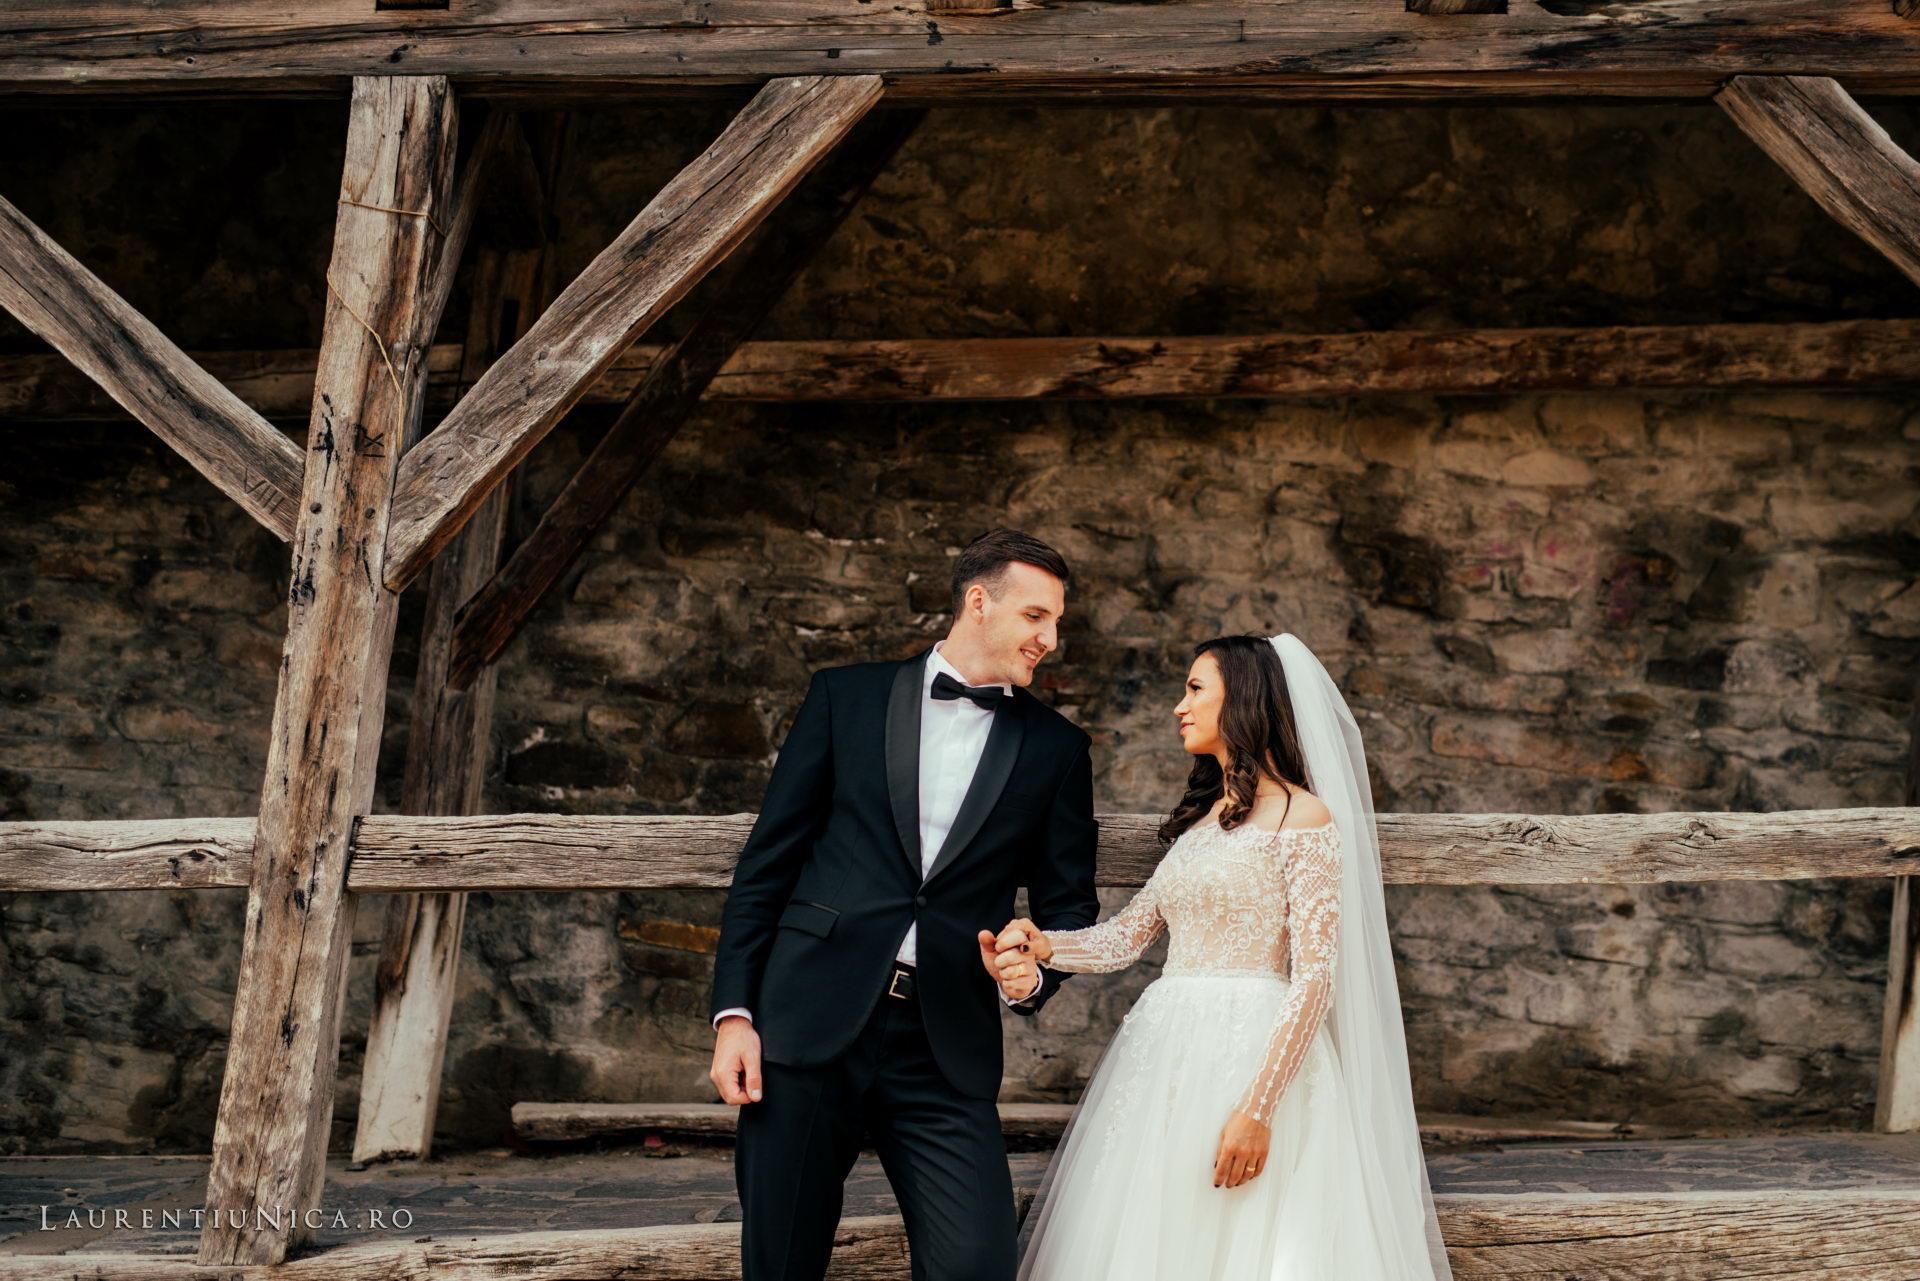 lili-si-dan-fotografii-nunta-after-wedding-sighisoara-laurentiu-nica02